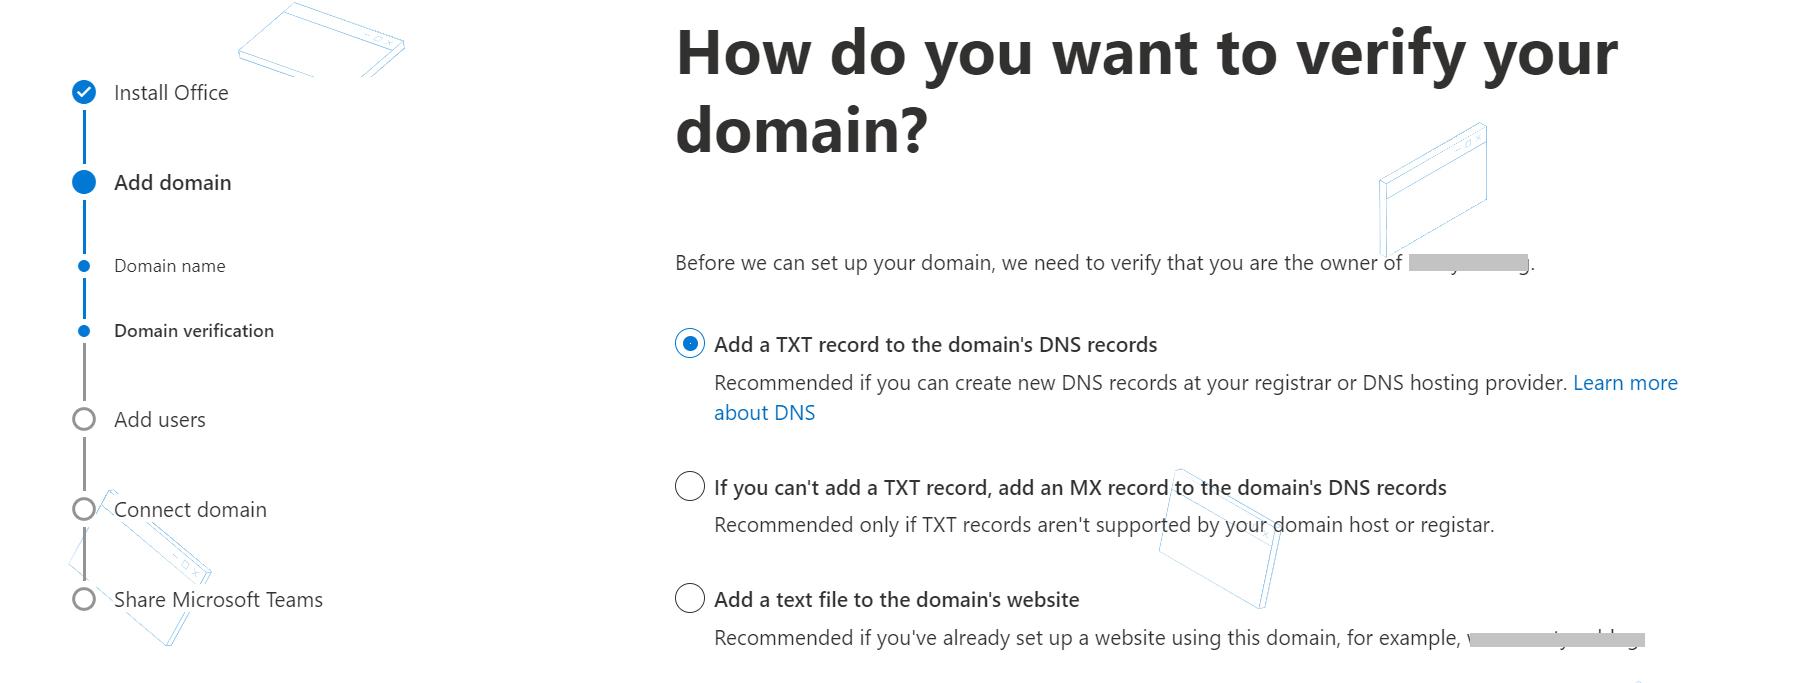 Verificación de dominio con Office 365